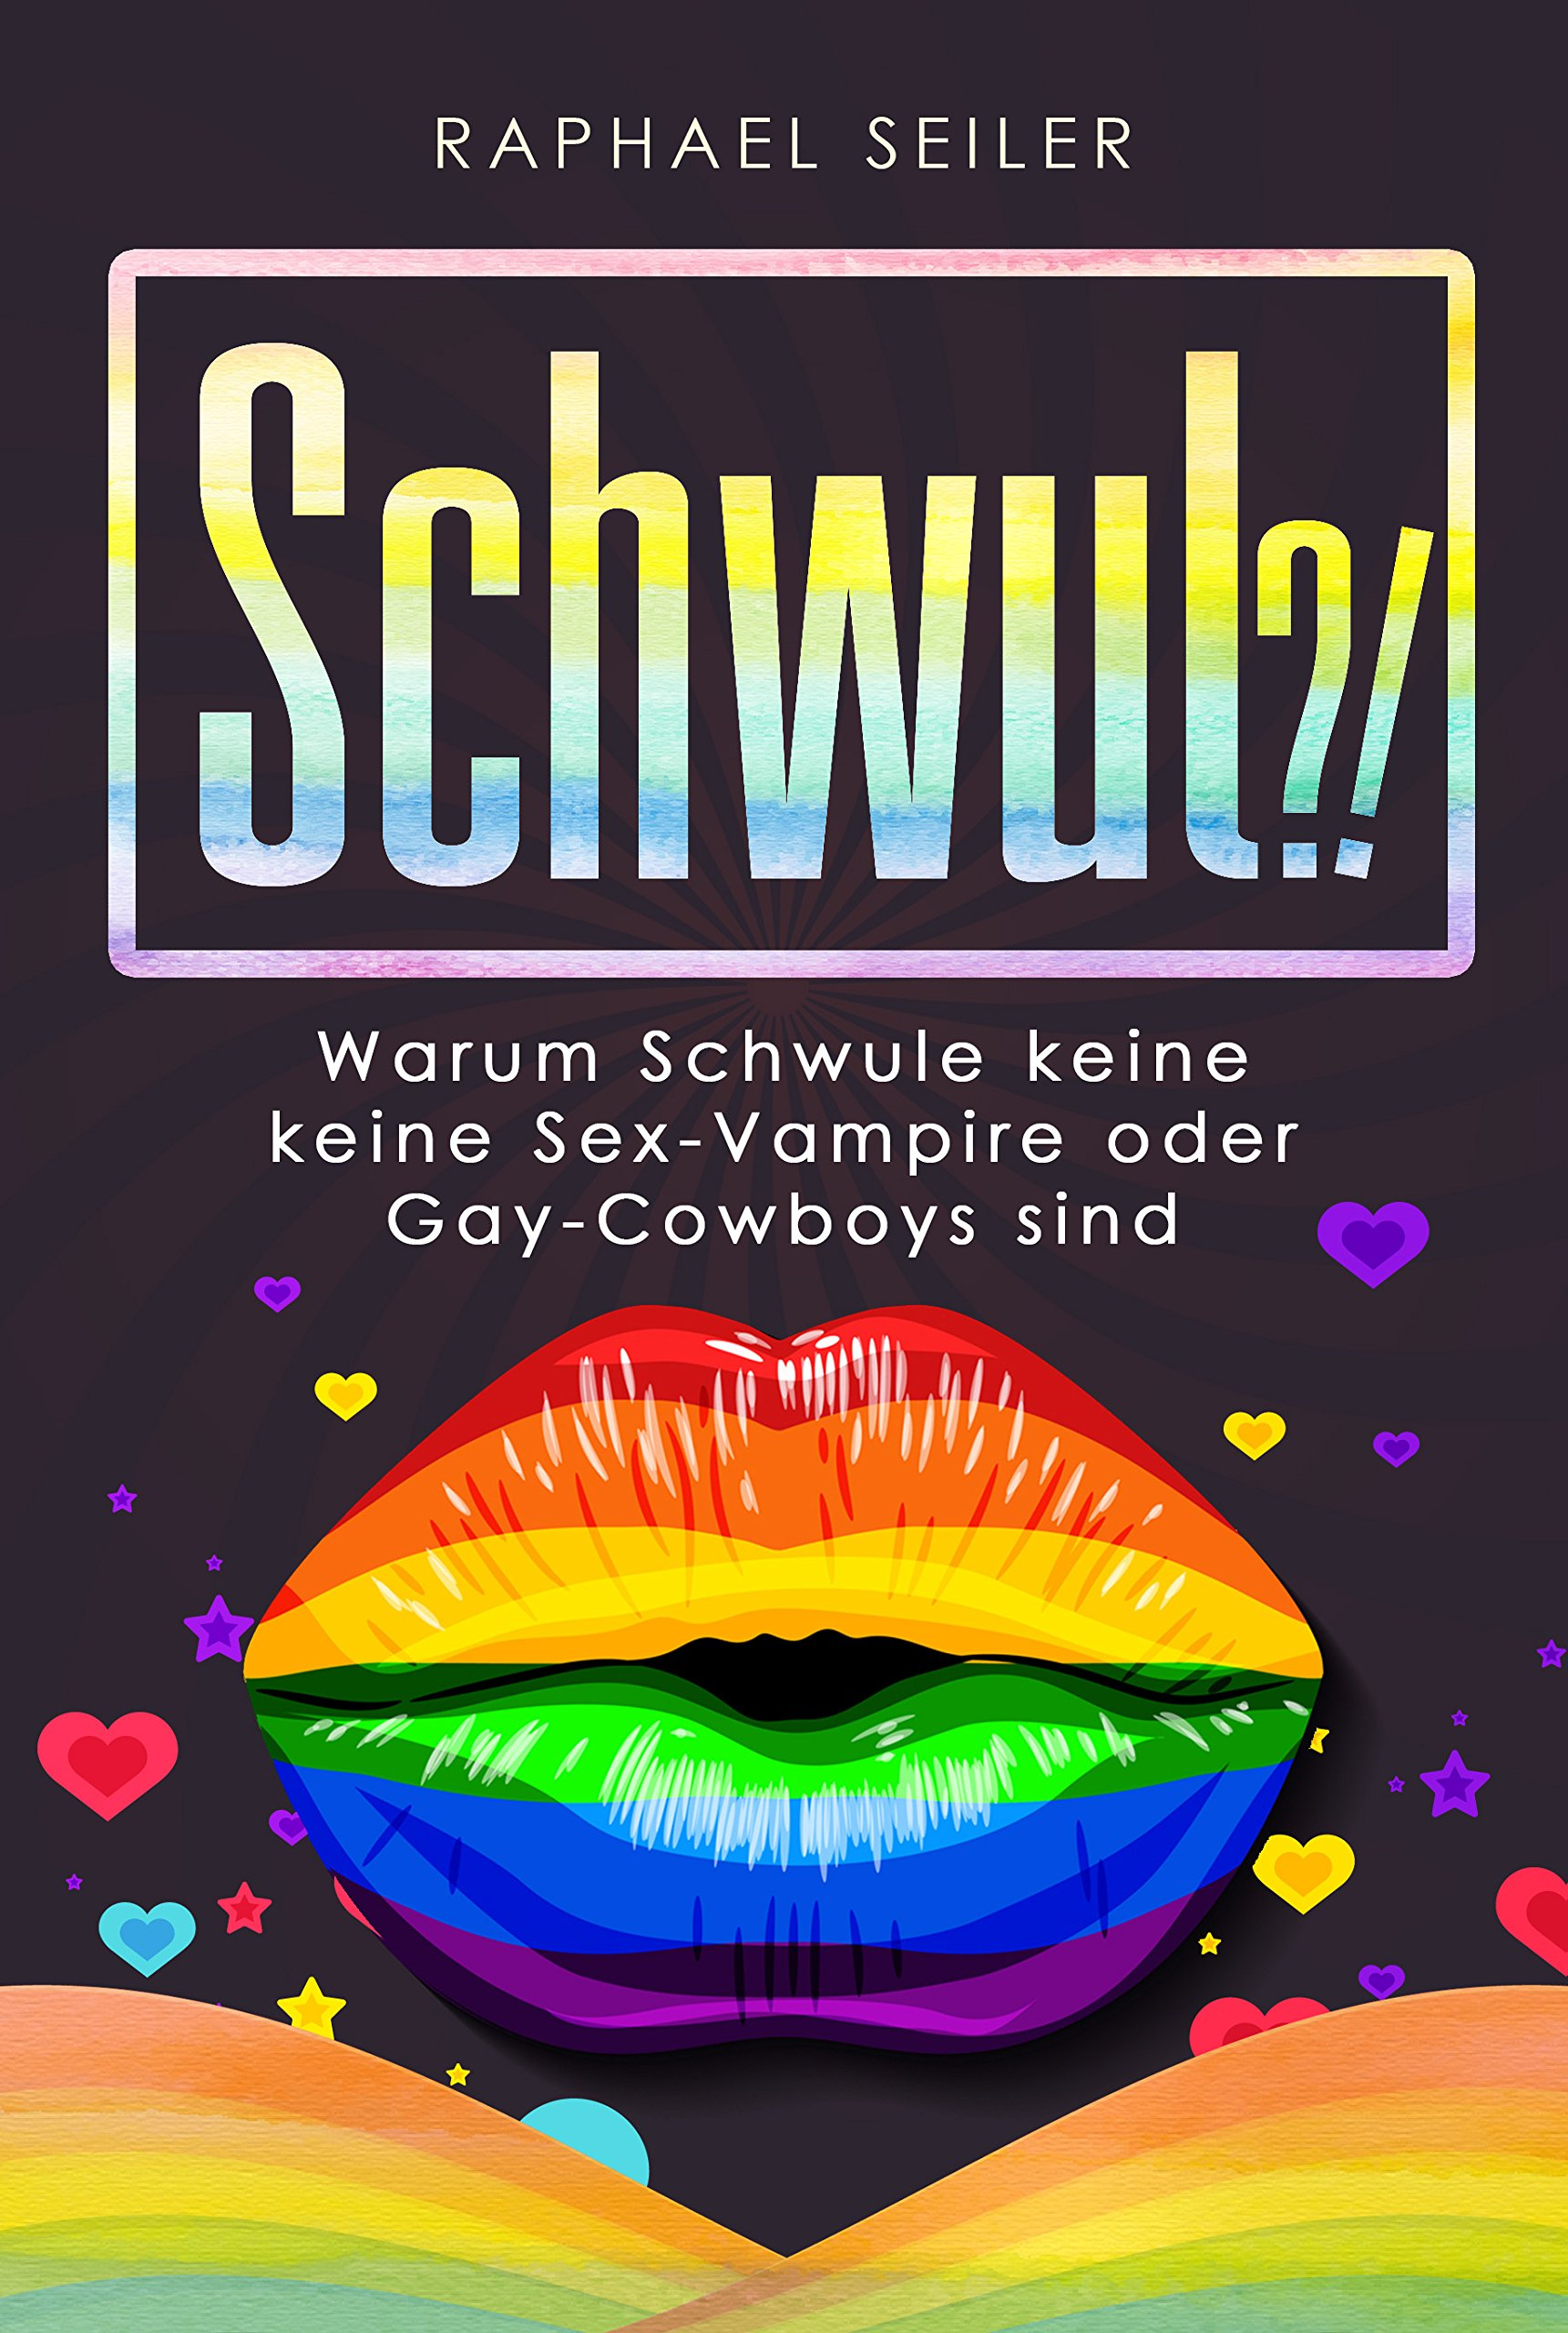 Schwul?! Warum Schwule keine Sex-Vampire oder Gay-Cowboys sind